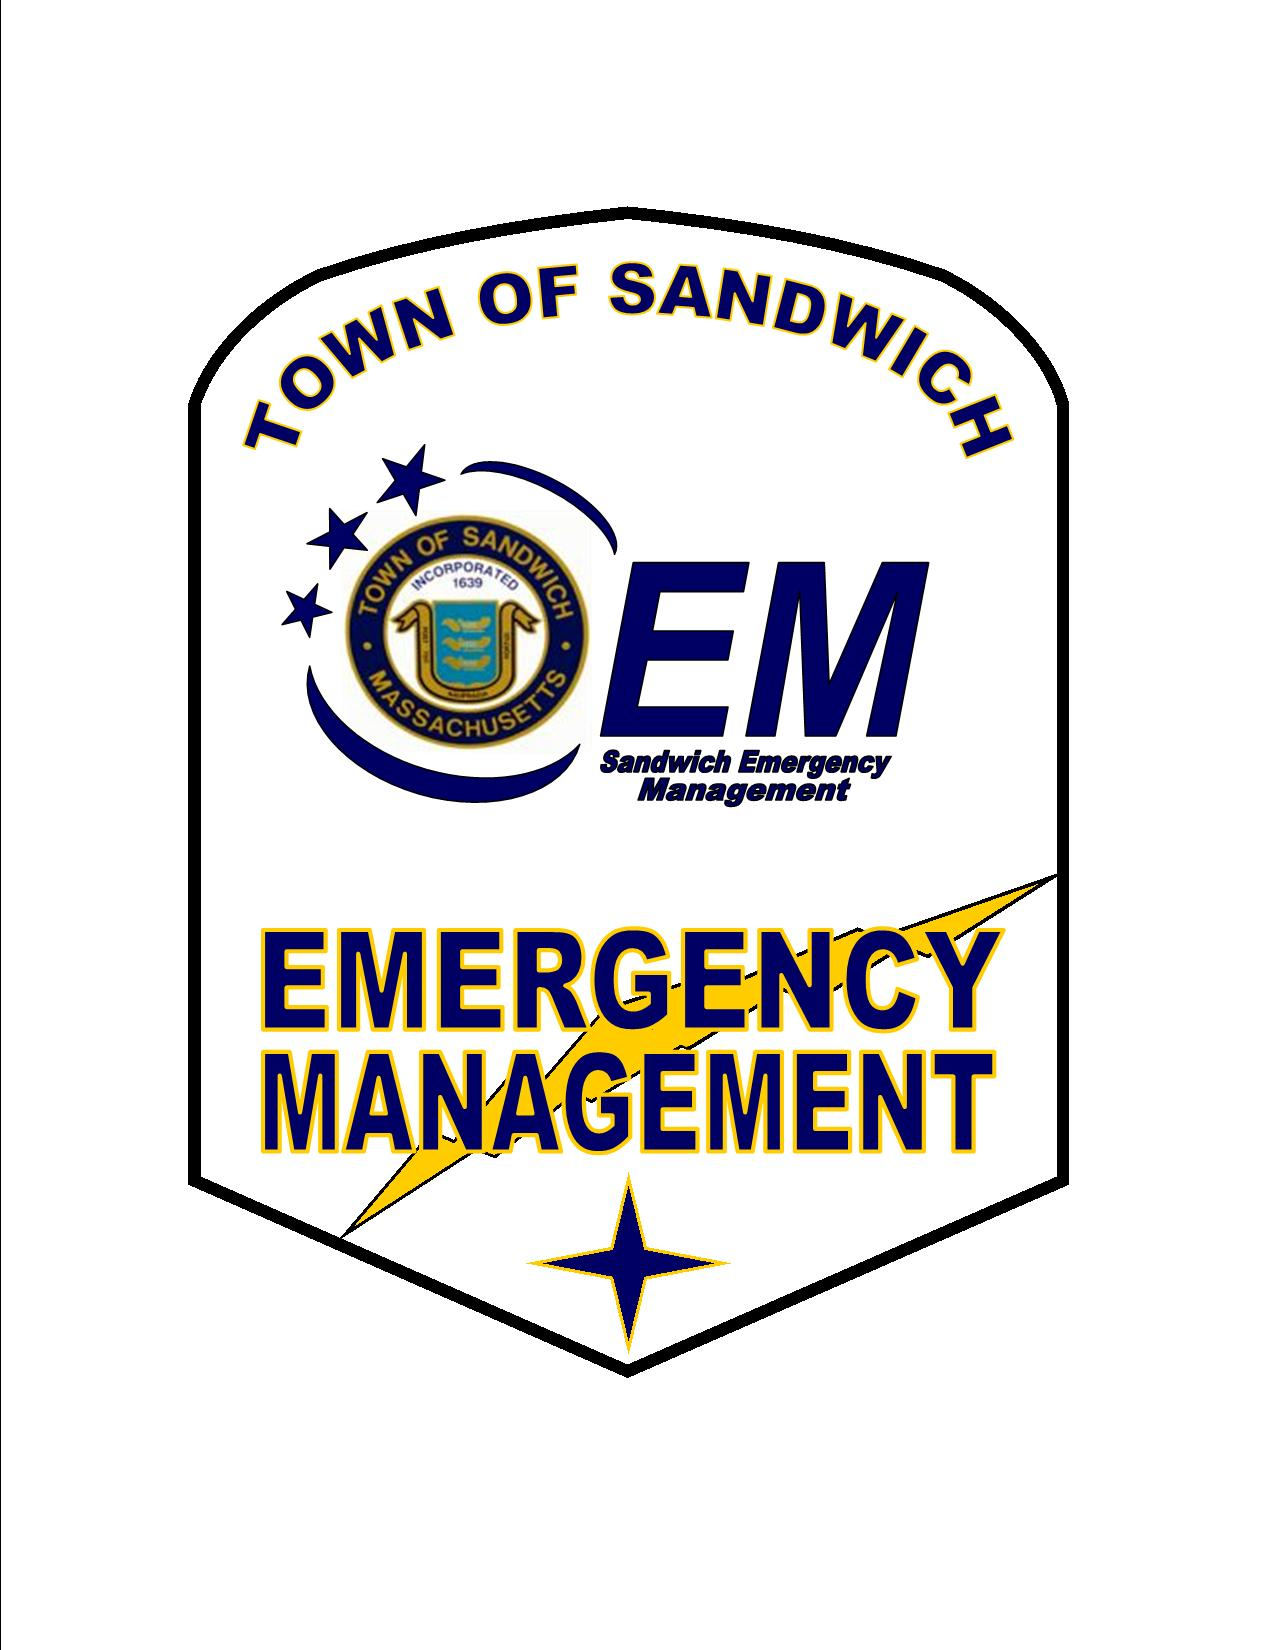 Sandwich Emergency Management 002 (2).jpg